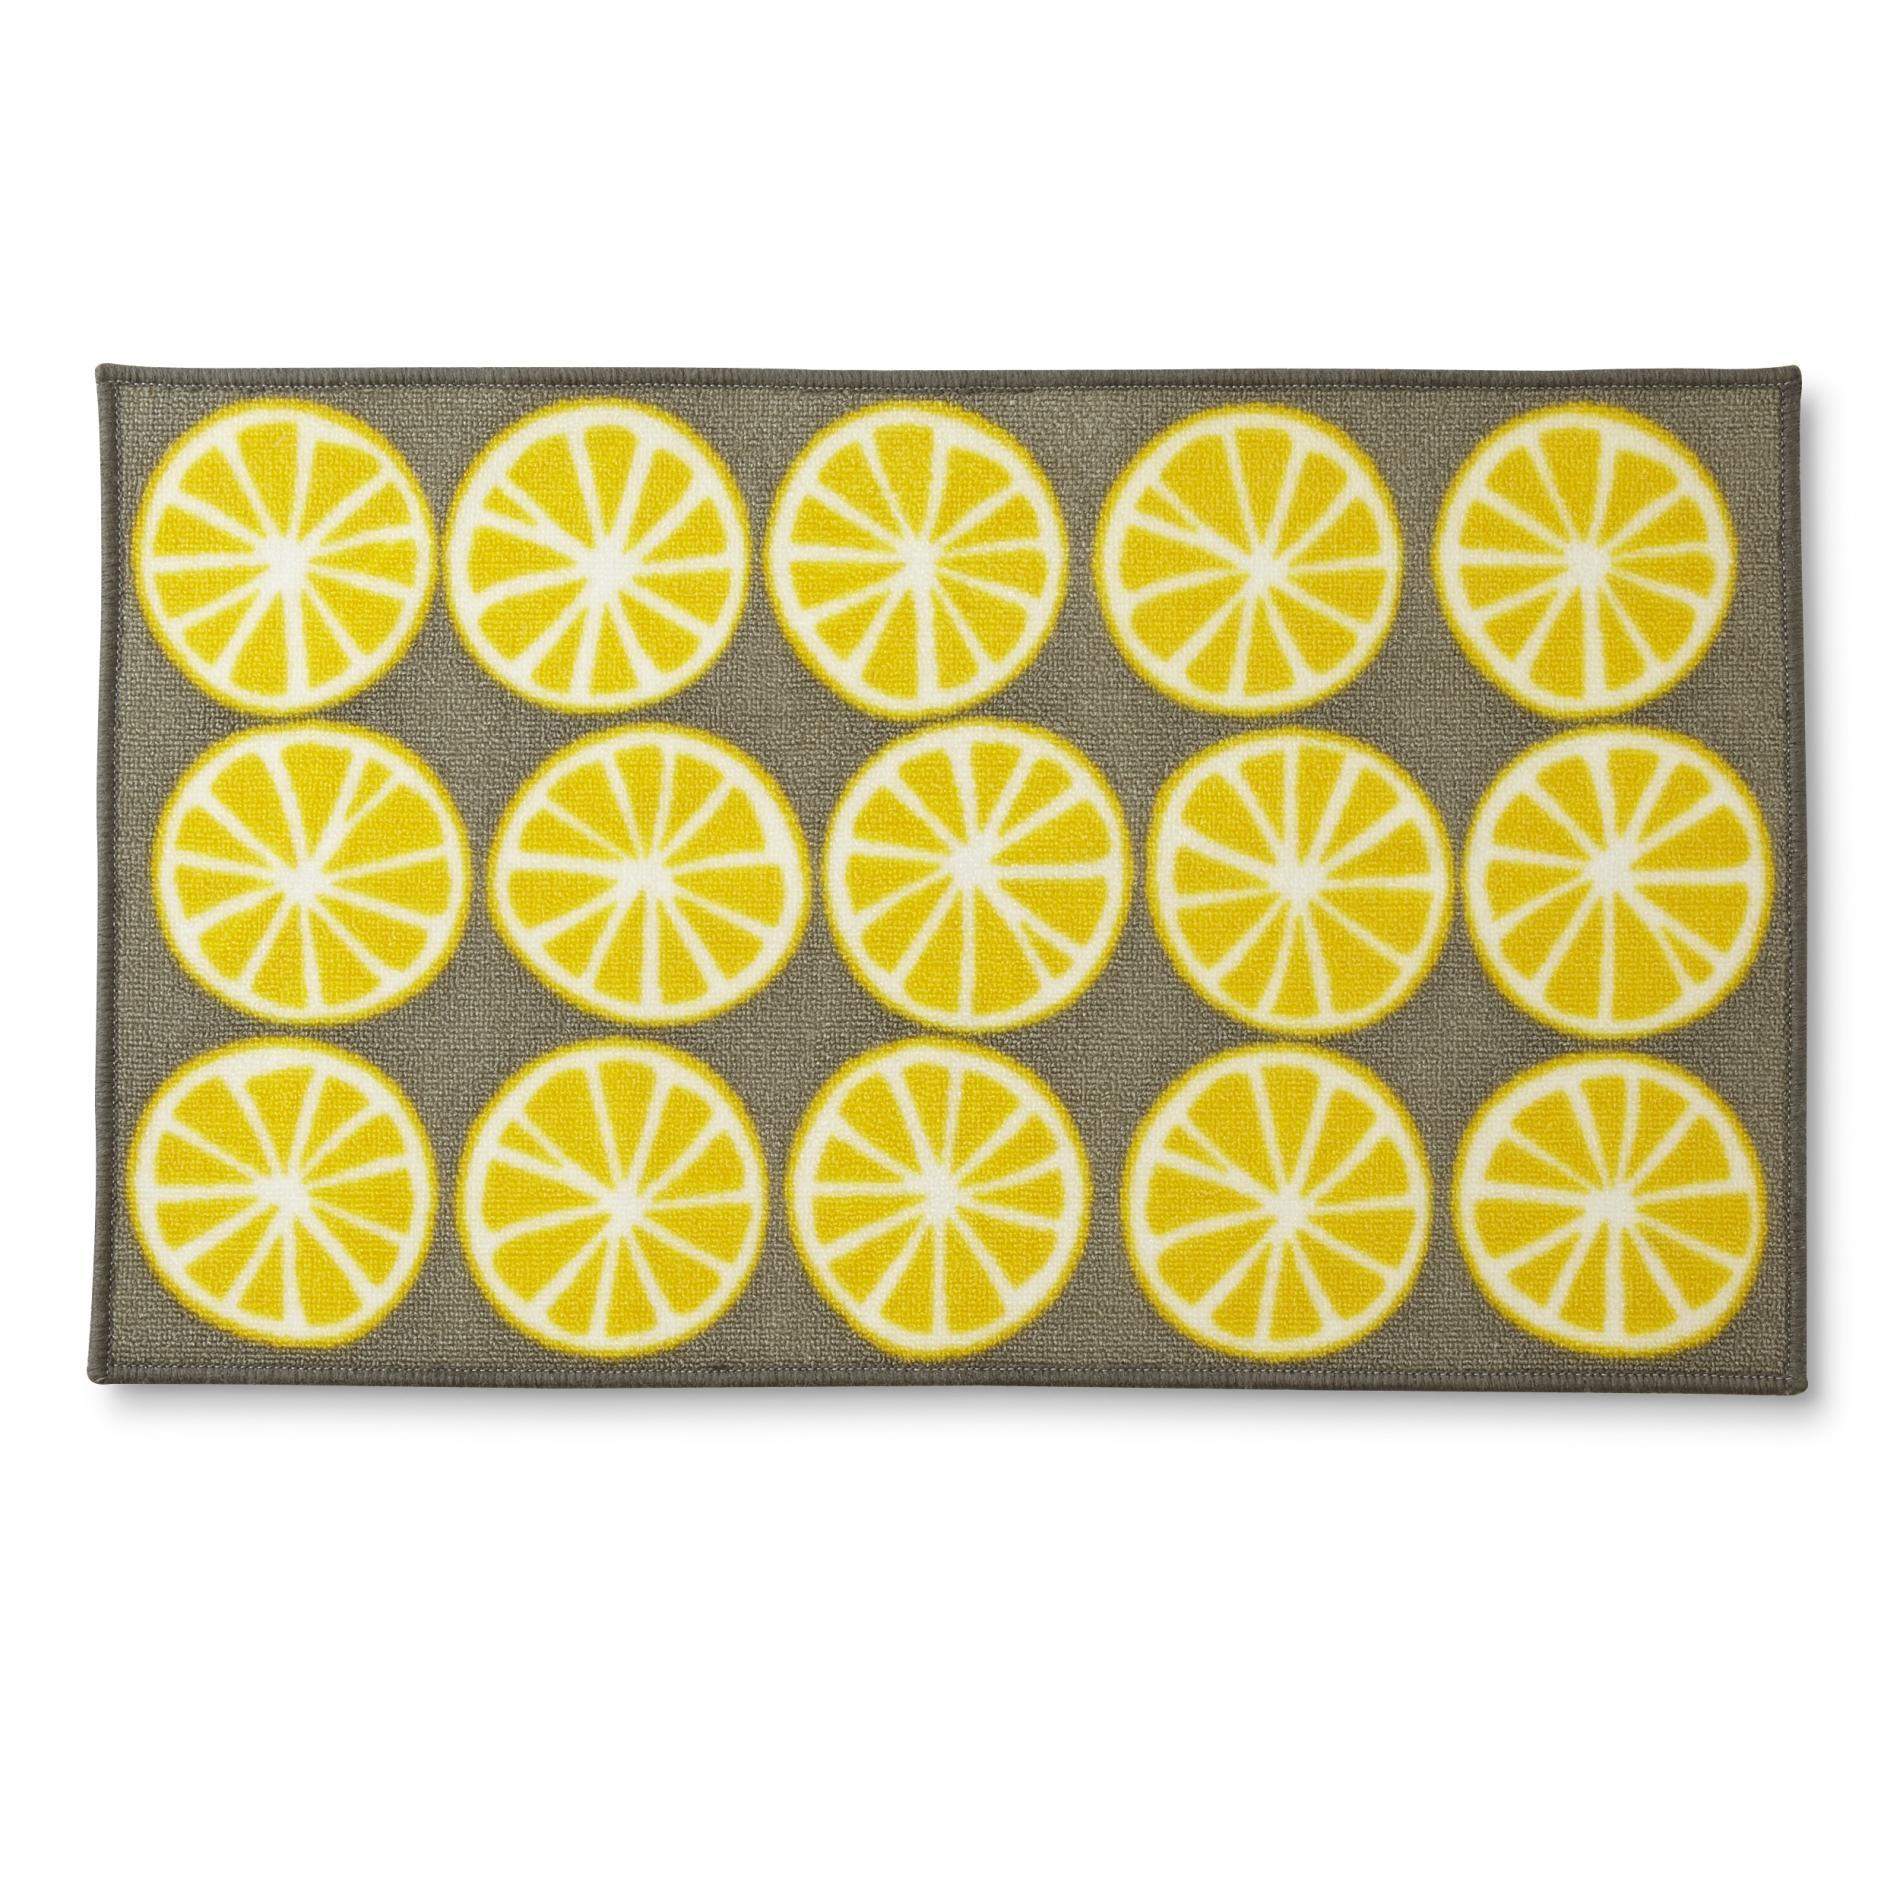 yellow kitchen rugs walmart aid mixer kmart allure rectangular rug lemons